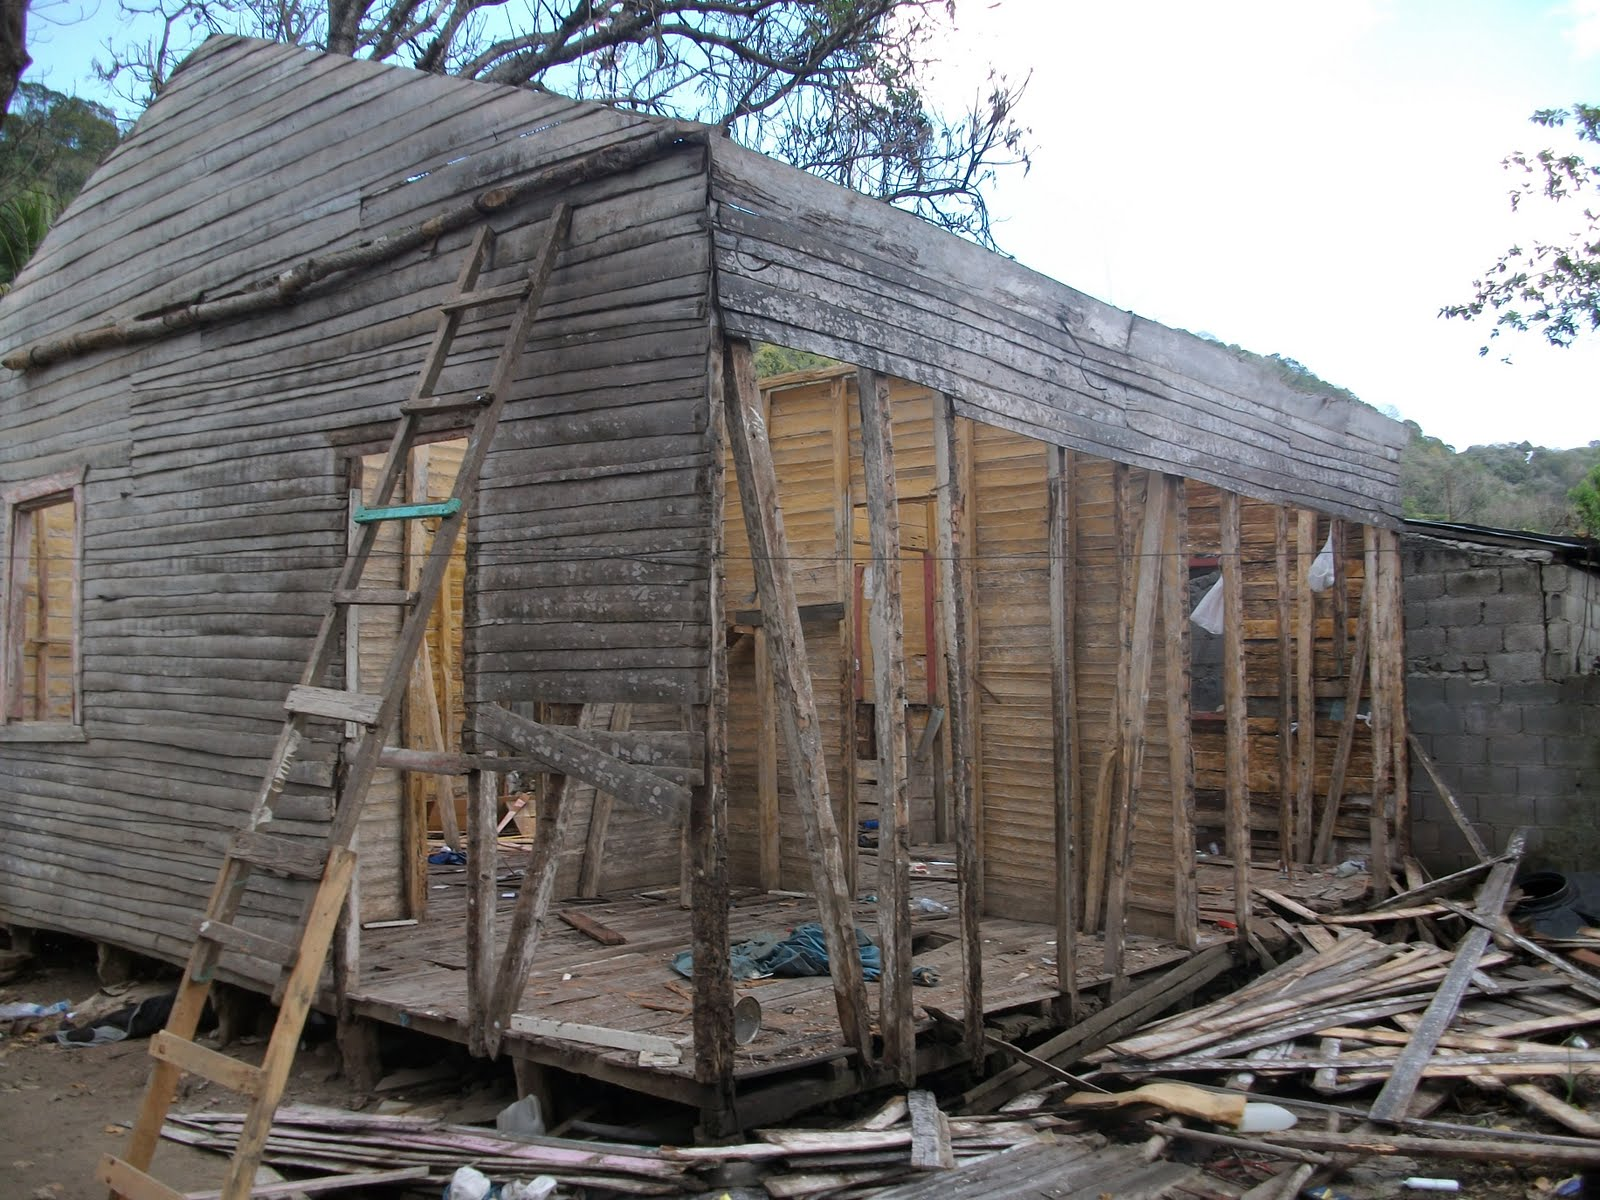 Baitoer soy desiden desbaratar casa vieja del centro del - Fotos de casas de madera por dentro ...